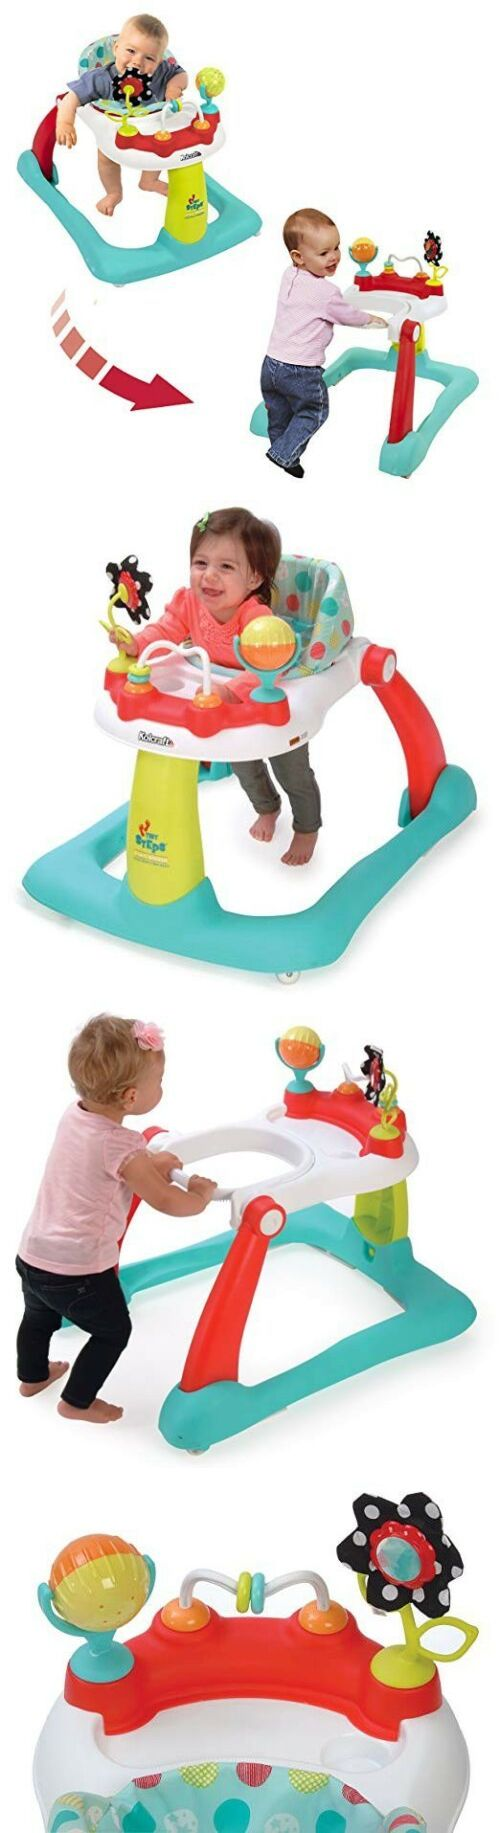 33070ba47 Walkers 134282  Kolcraft Tiny Steps 2 In 1 Baby Activity Walker ...